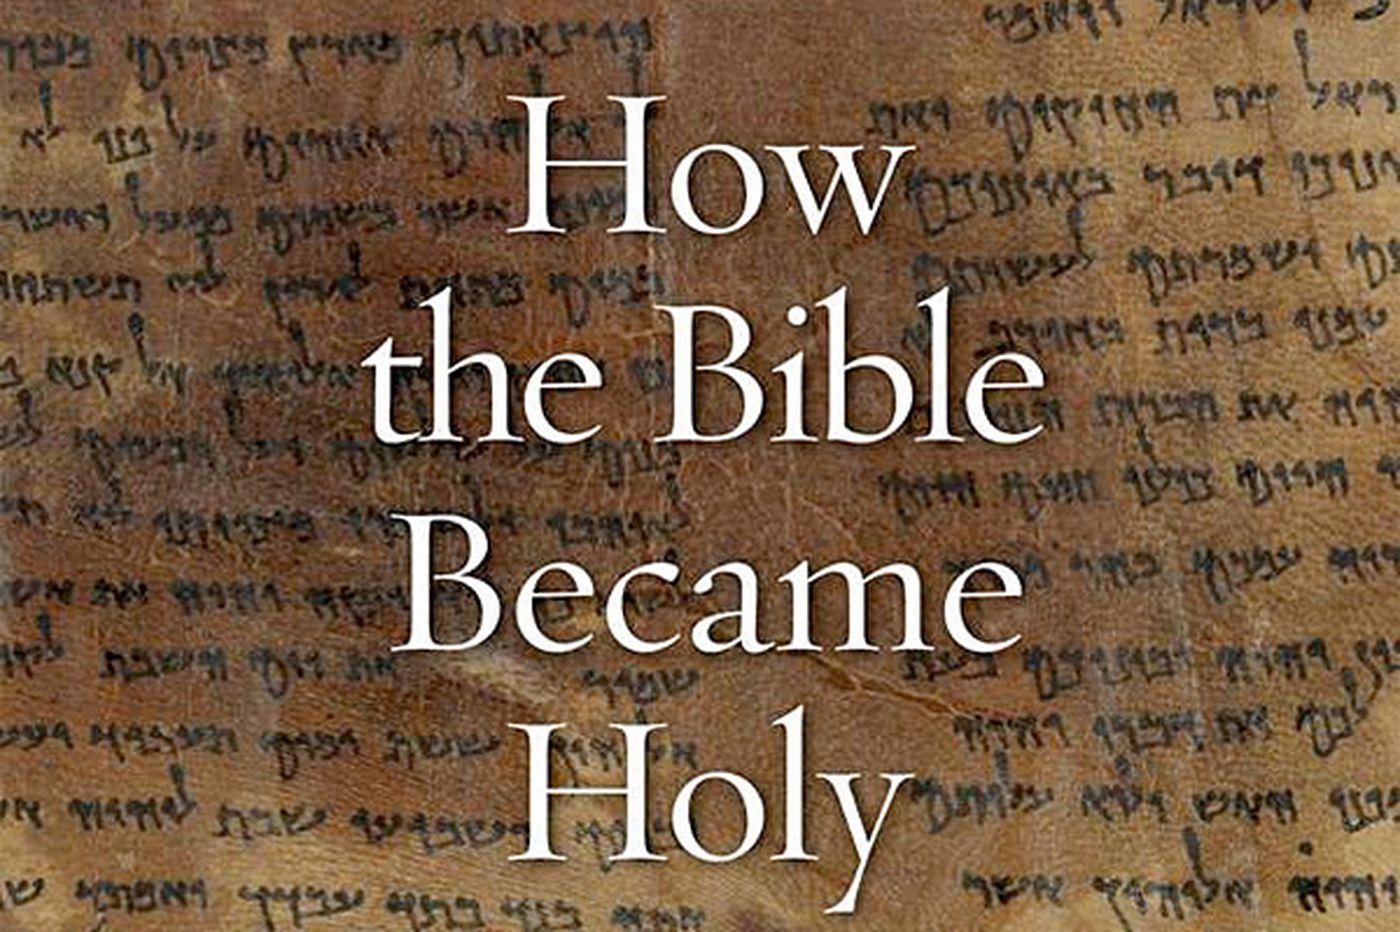 Picking and choosing among sacred texts to make the Bible